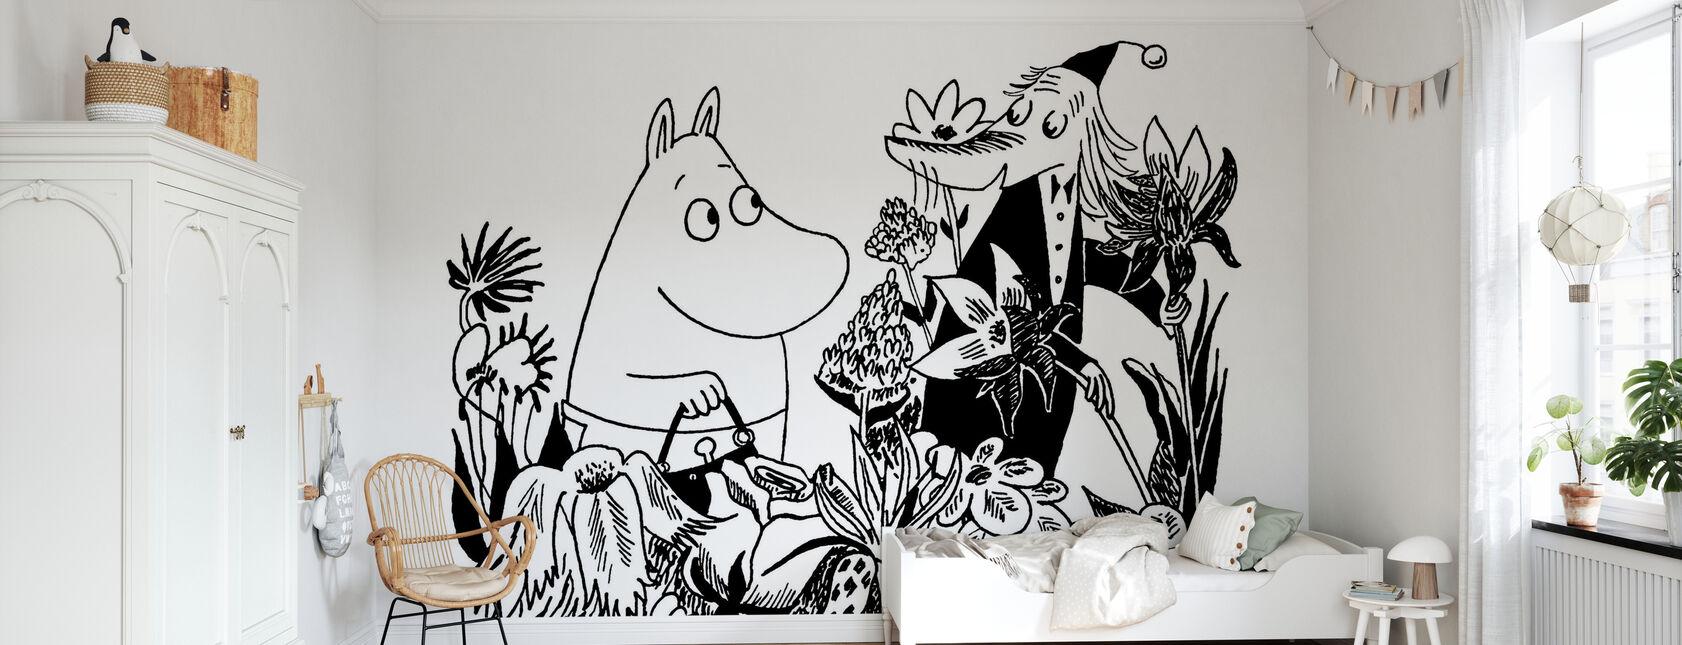 Moominmamma and Fillyjonk - Wallpaper - Kids Room